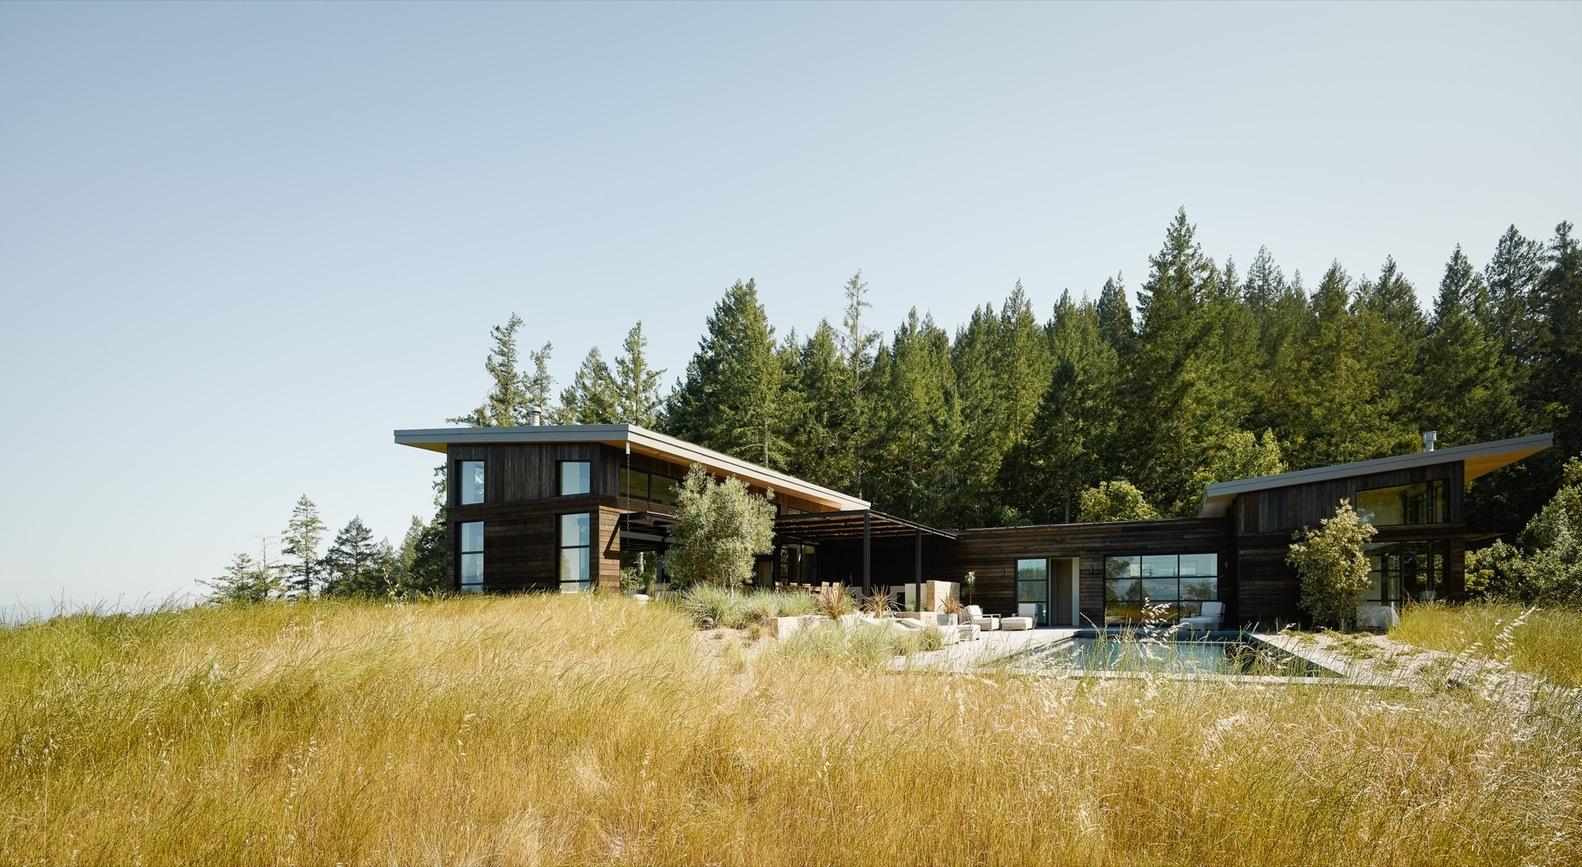 Healdsburg Feldman Architecture - thetreemag | ello